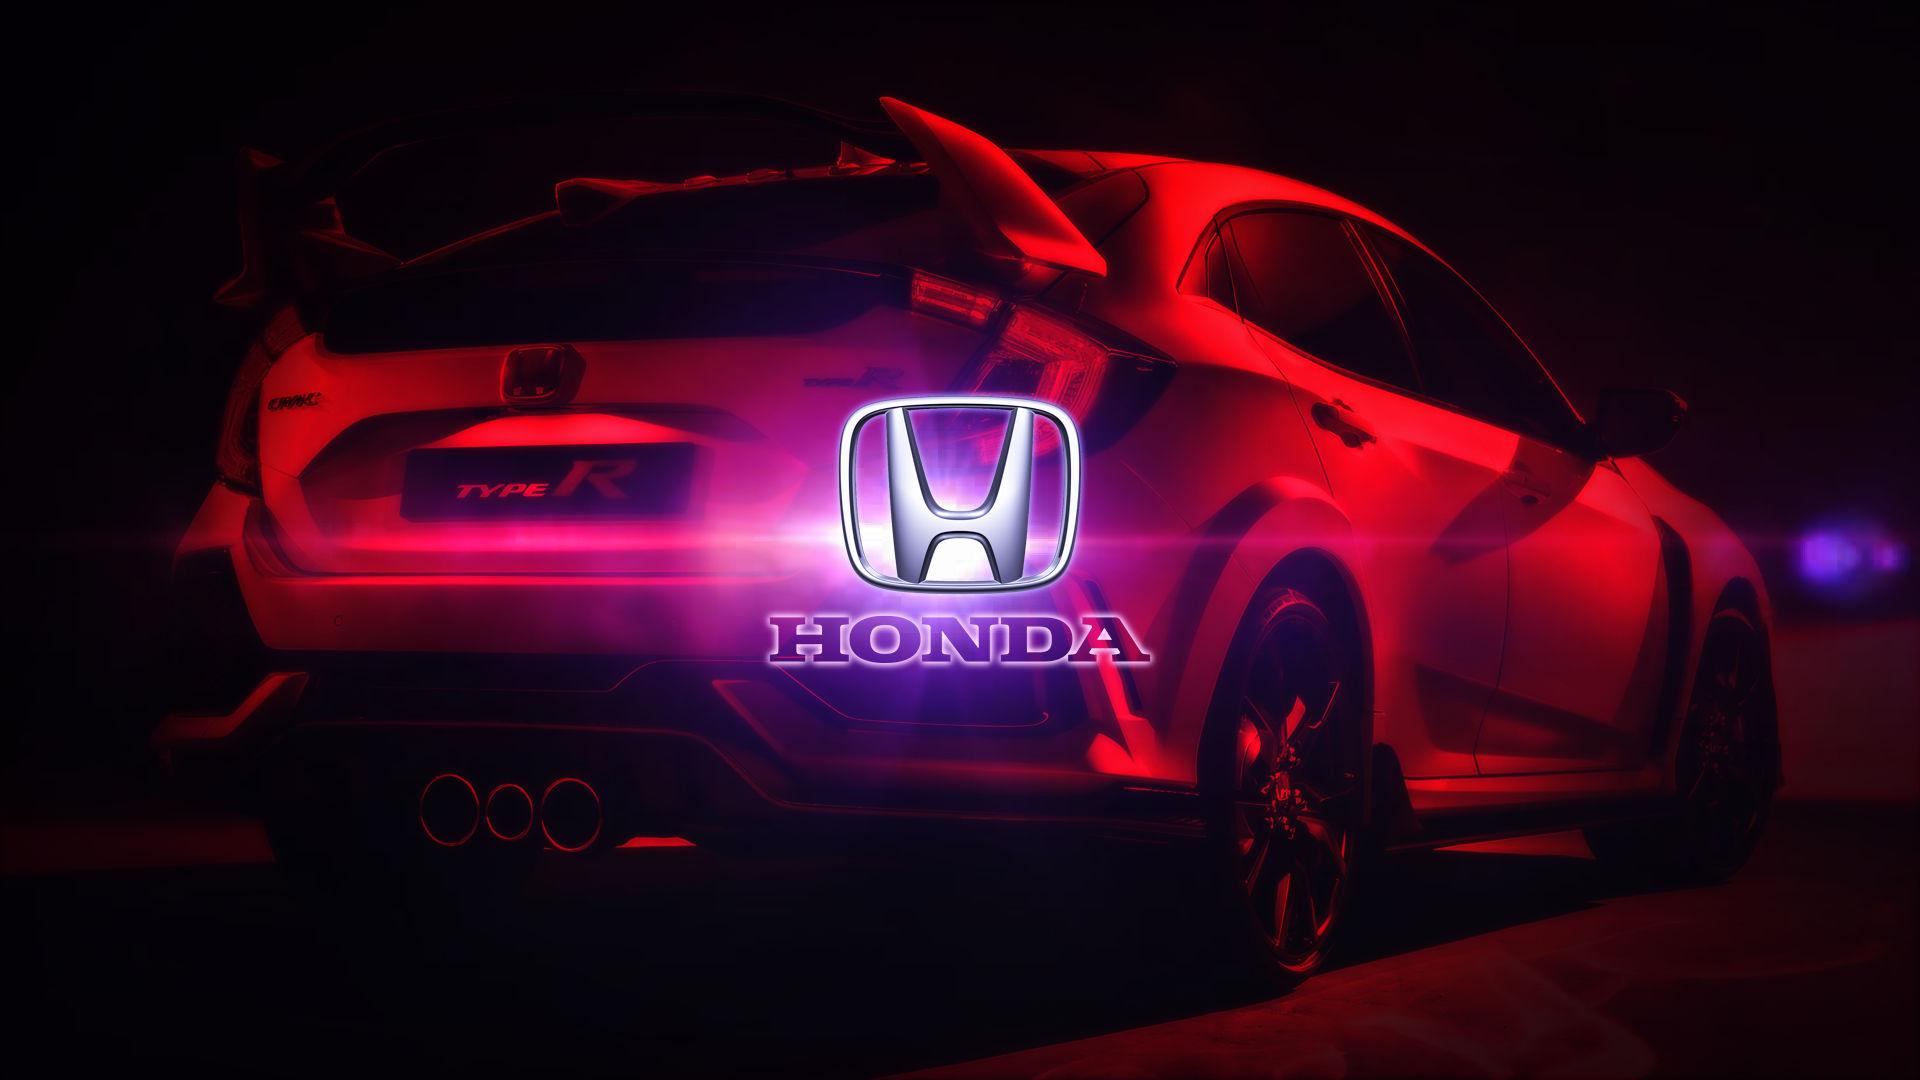 Honda Civic Wallpaper Hd